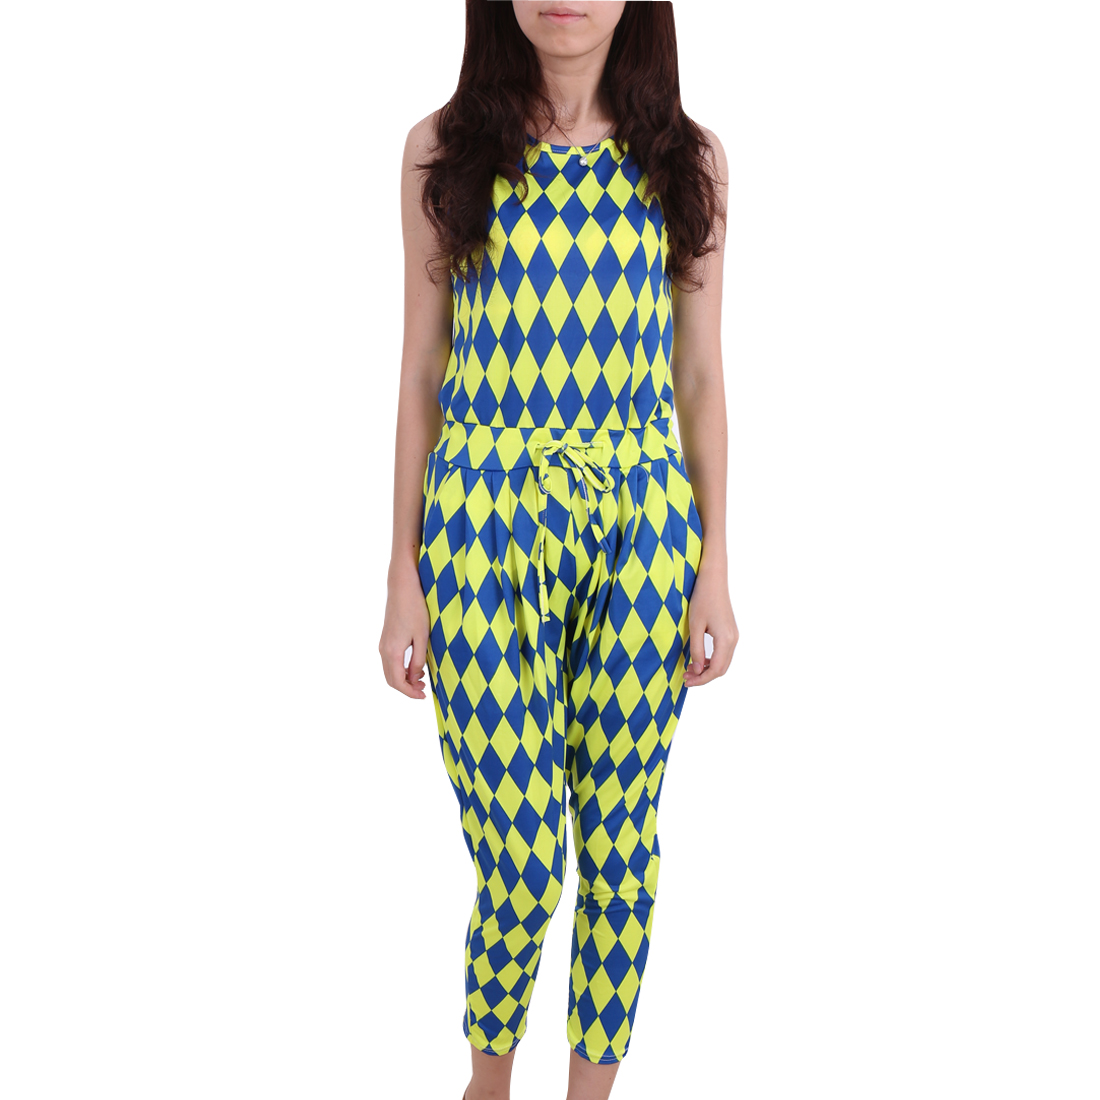 Women Argyle Pattern Round Neck Sleeveless Drawstring Jumpsuit Blue Lime S